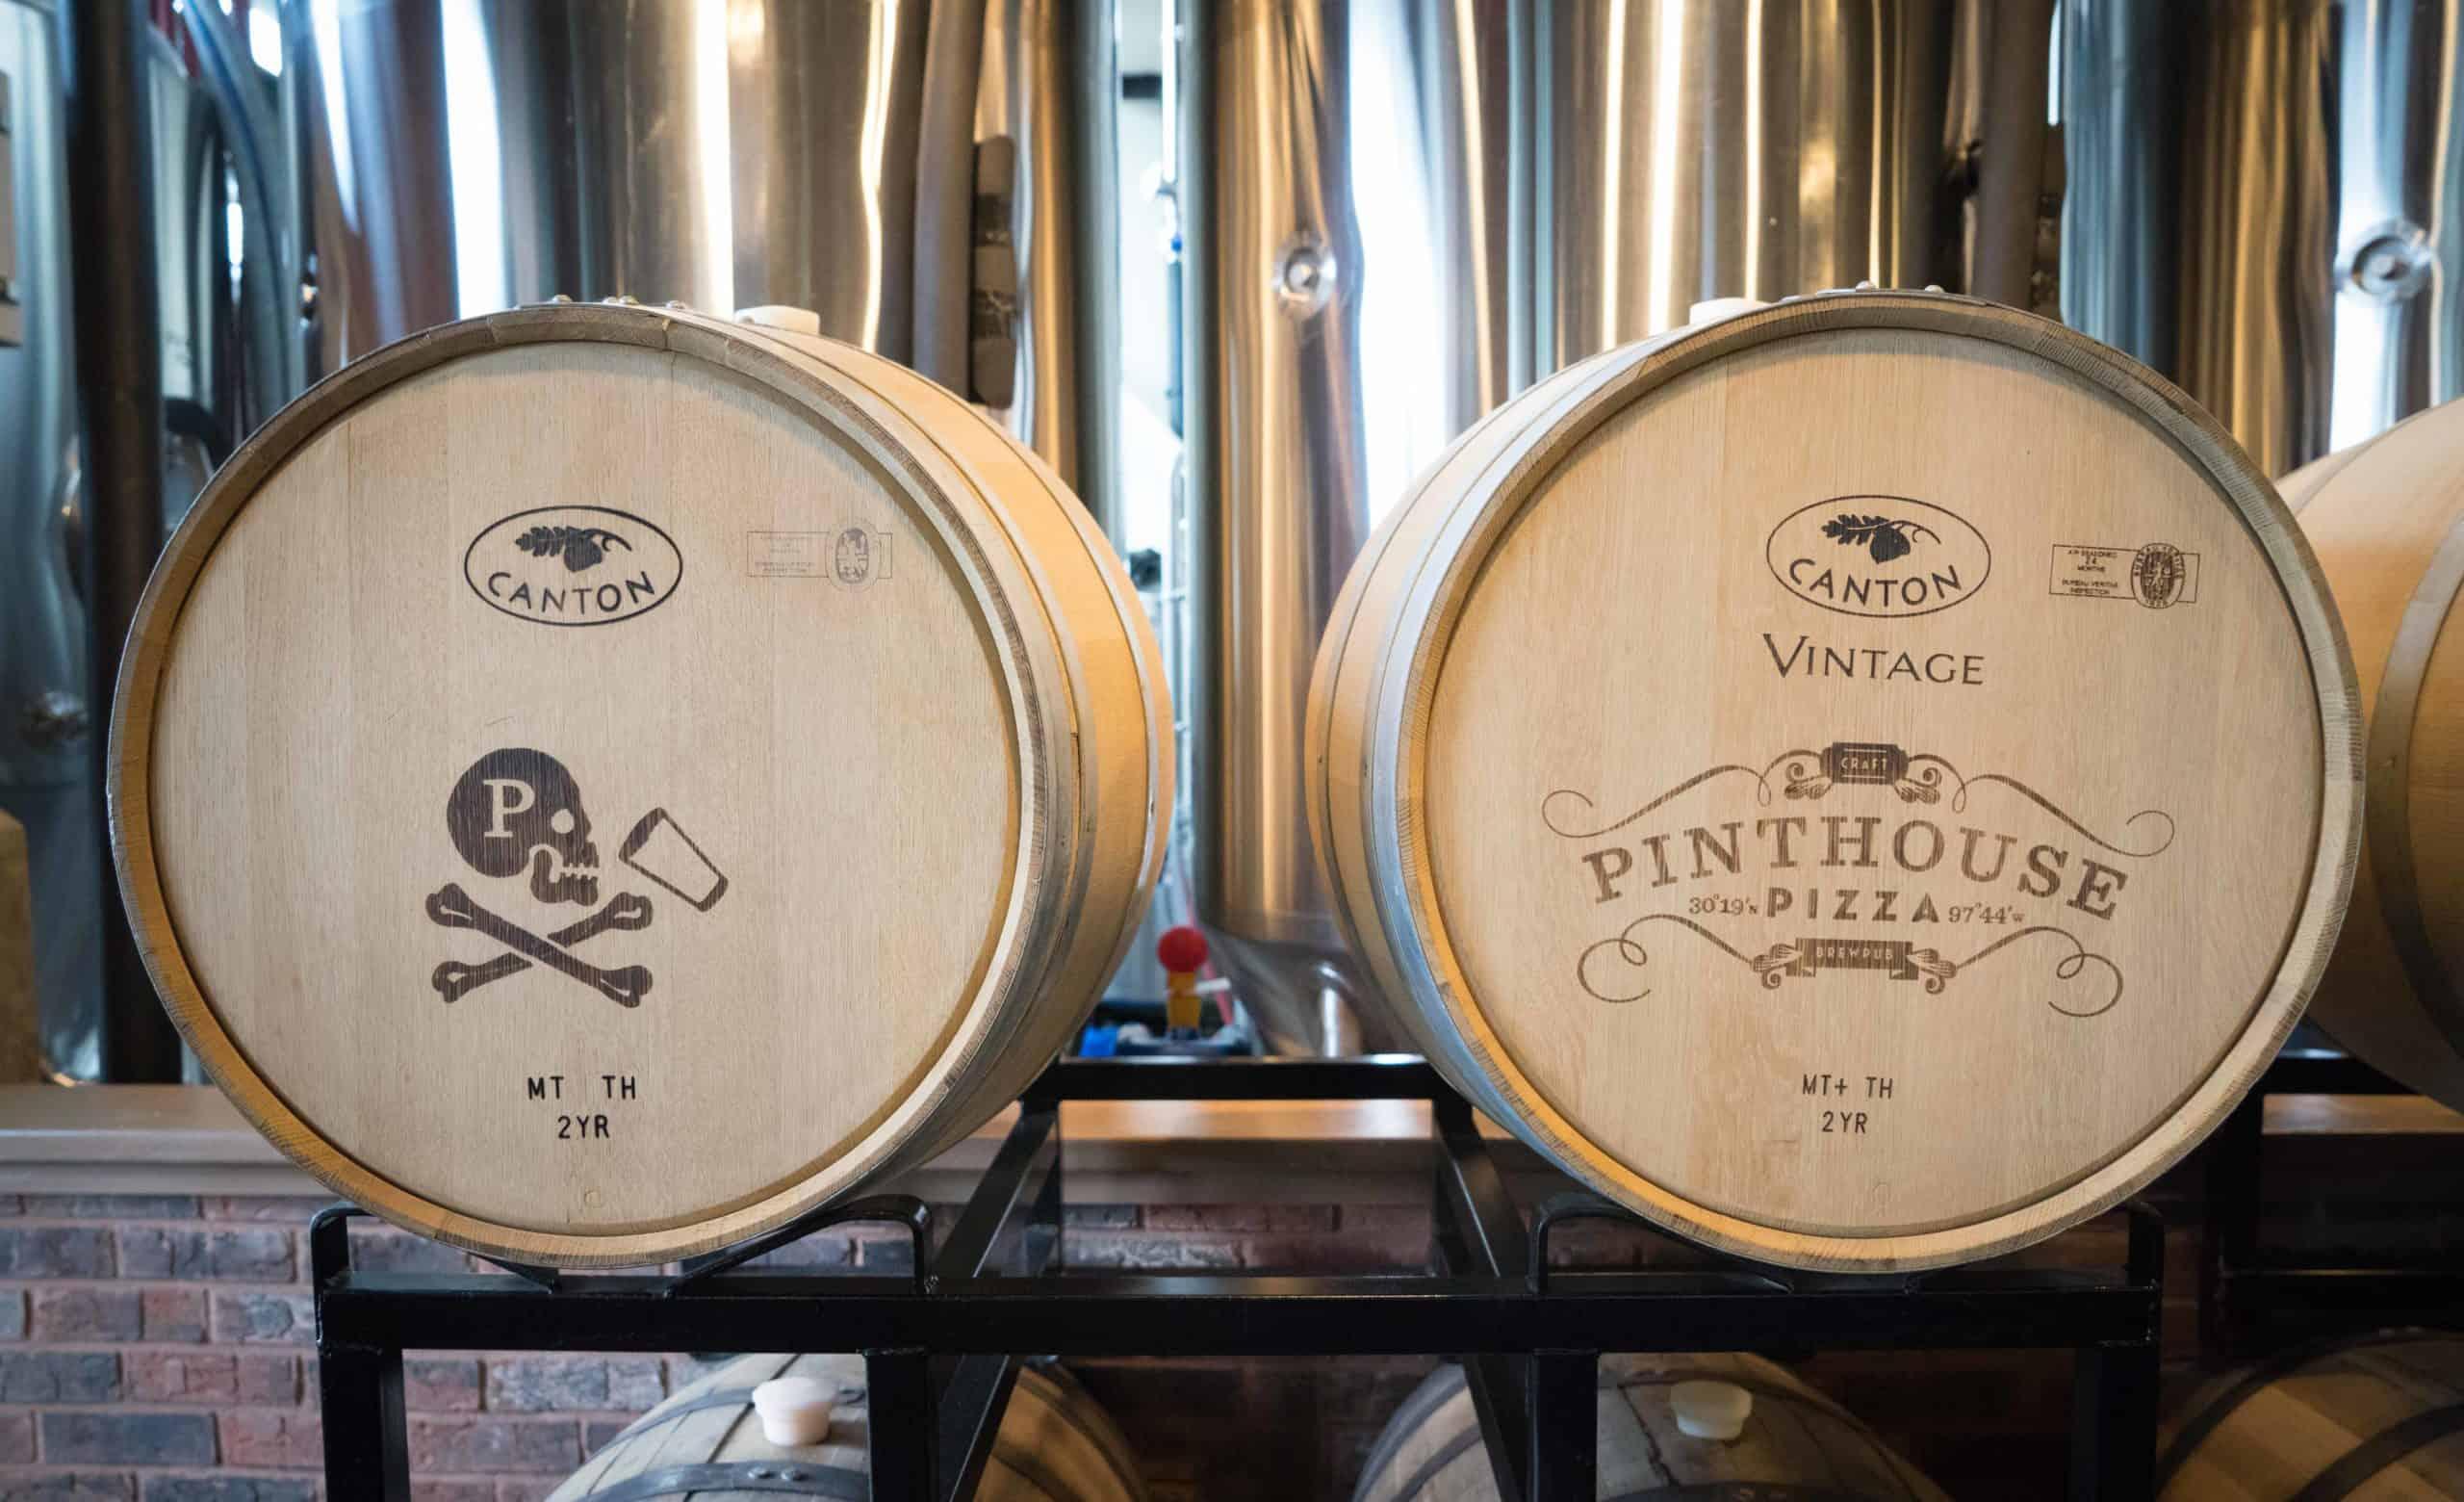 Pinthouse barrels